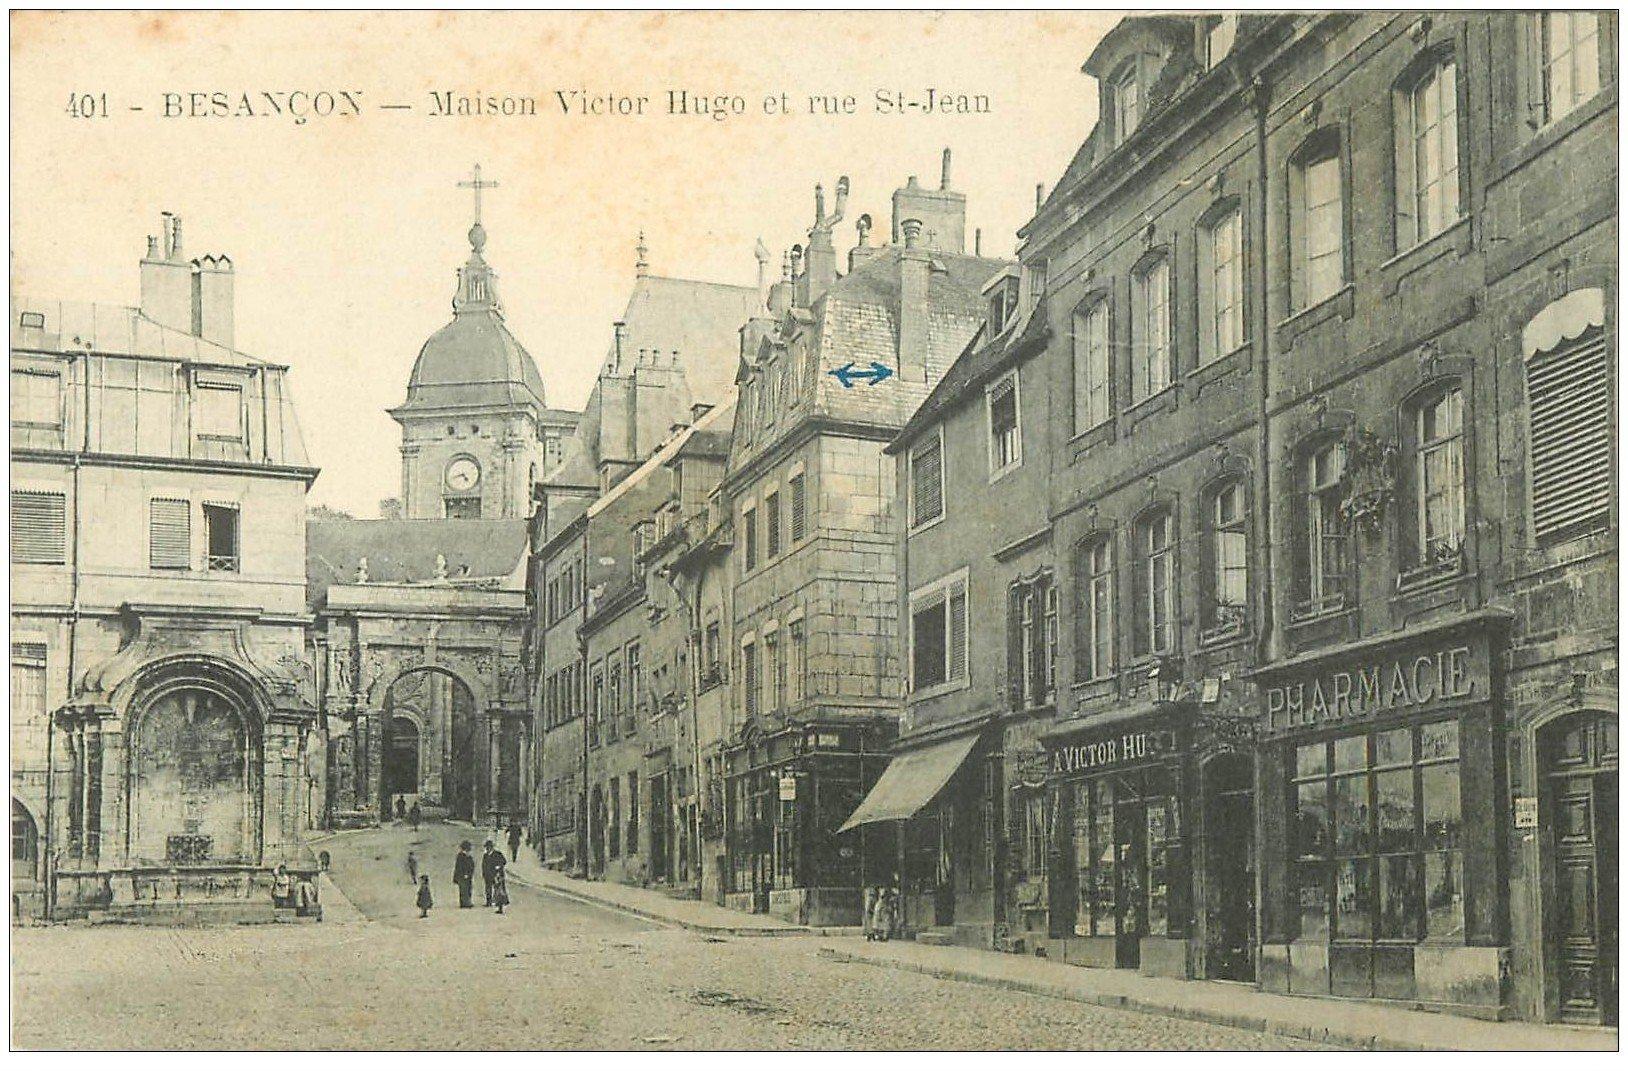 25 besancon maison victor hugo rue saint jean pharmacie for 25 besancon